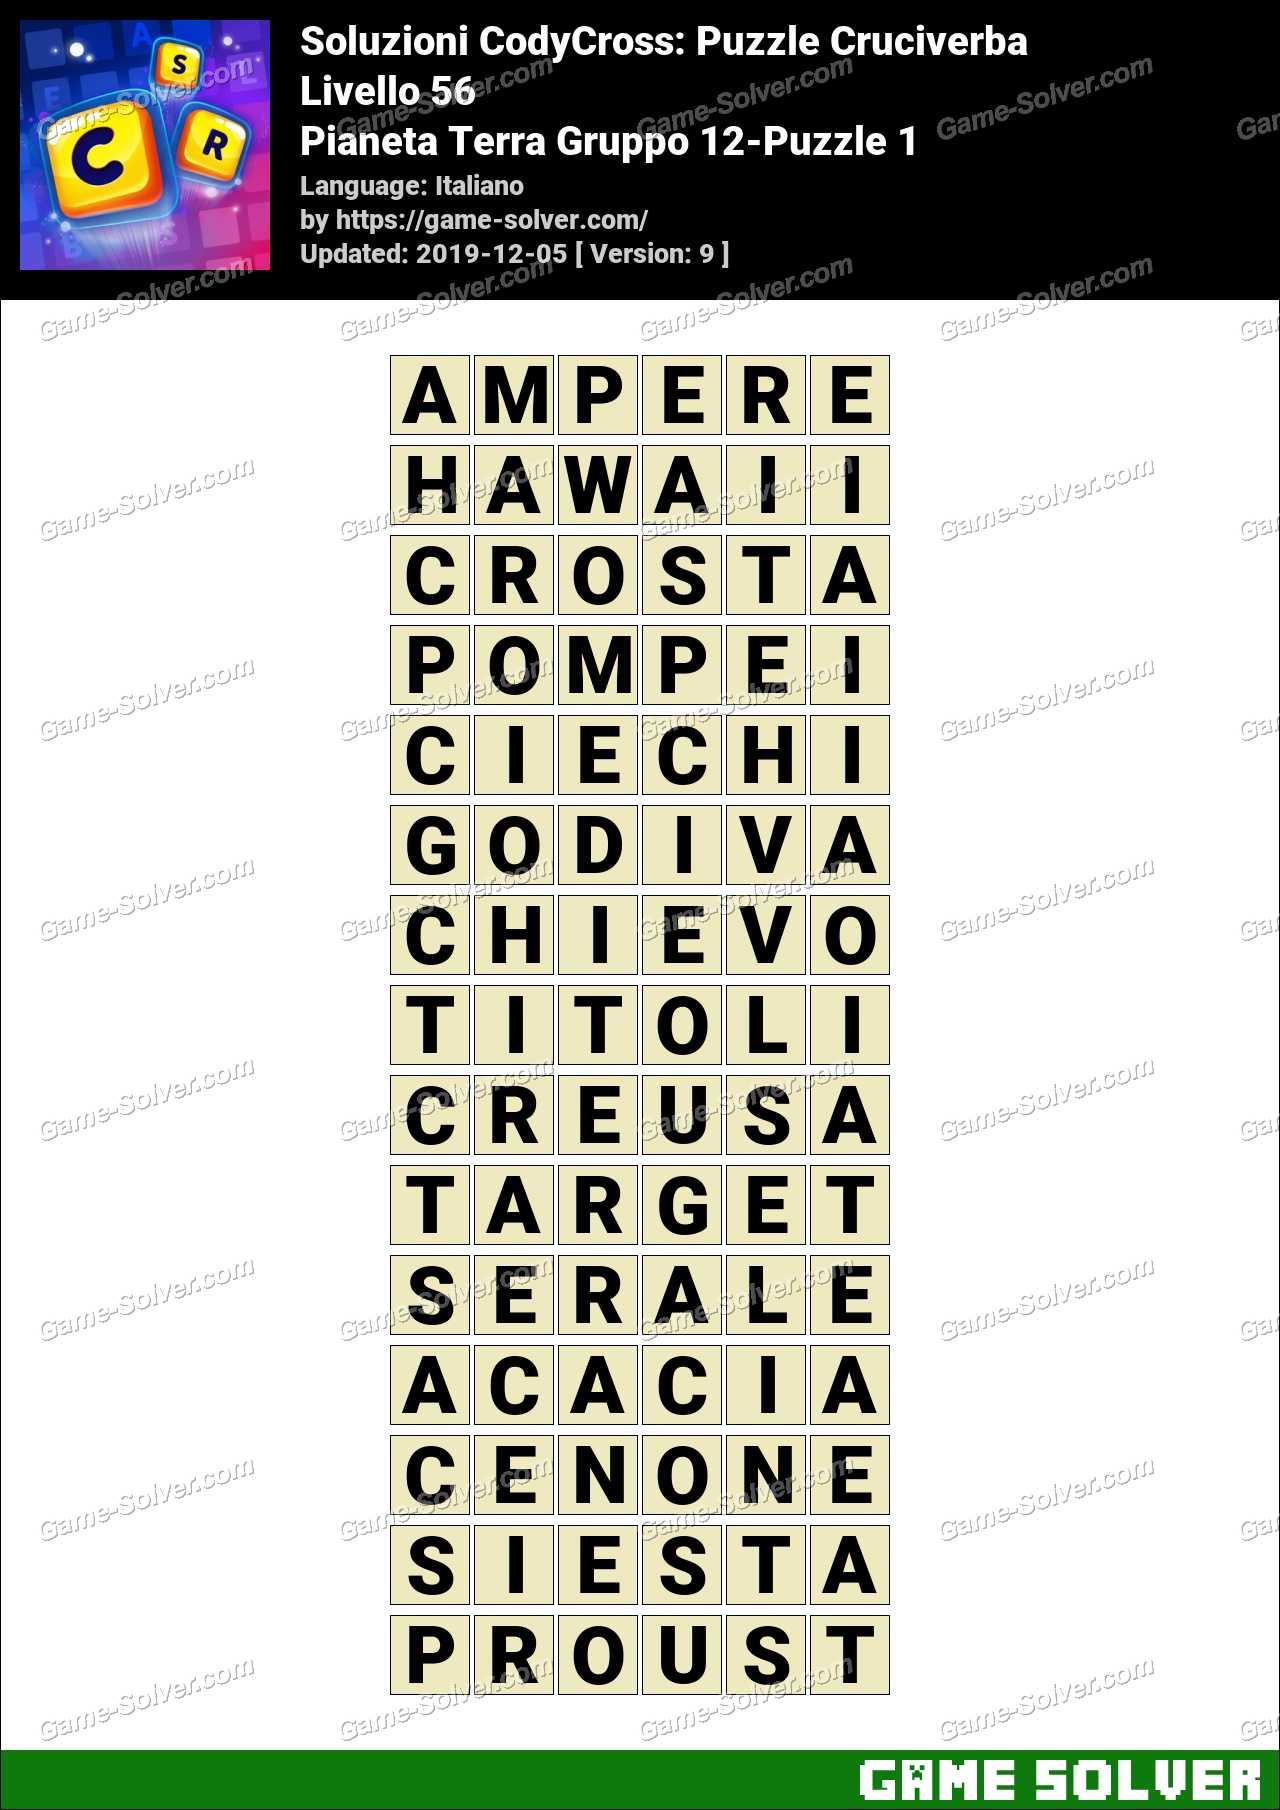 Soluzioni CodyCross Pianeta Terra Gruppo 12-Puzzle 1